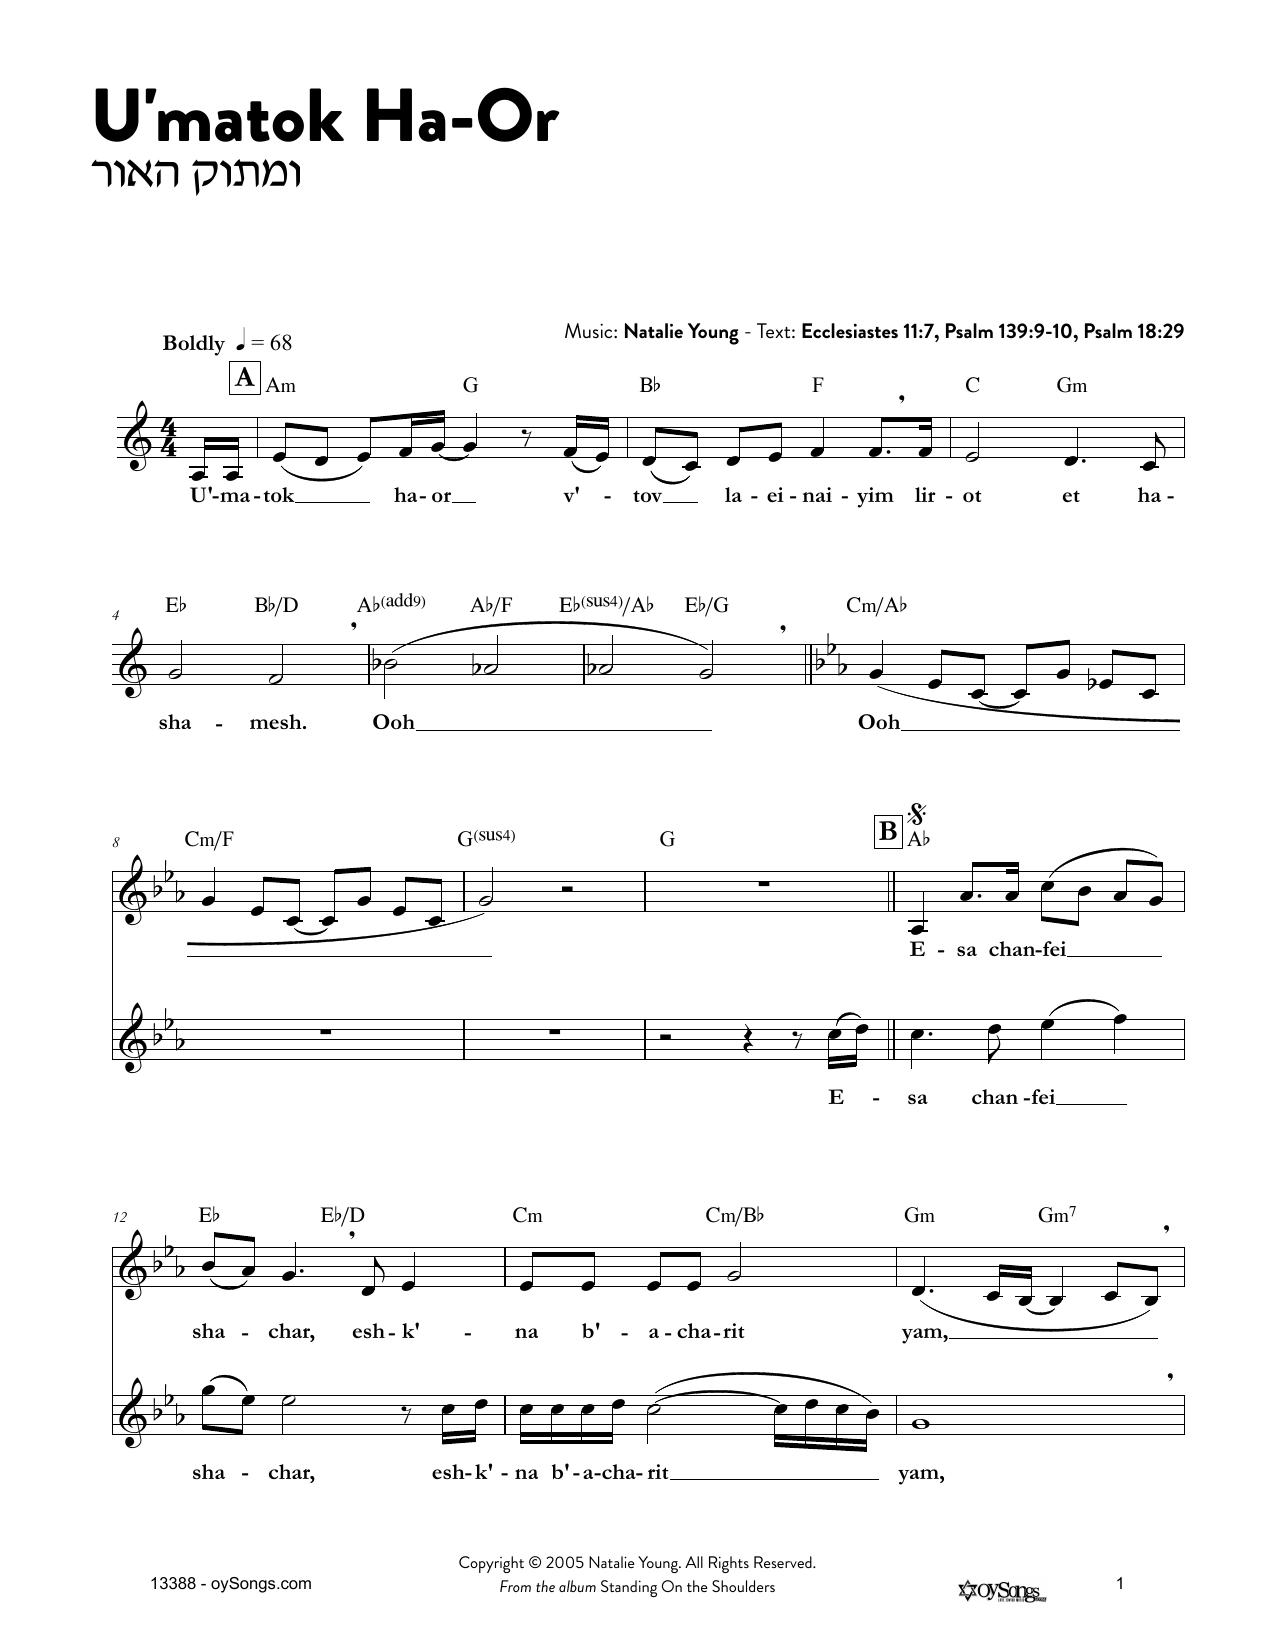 U'matok HaOr Sheet Music